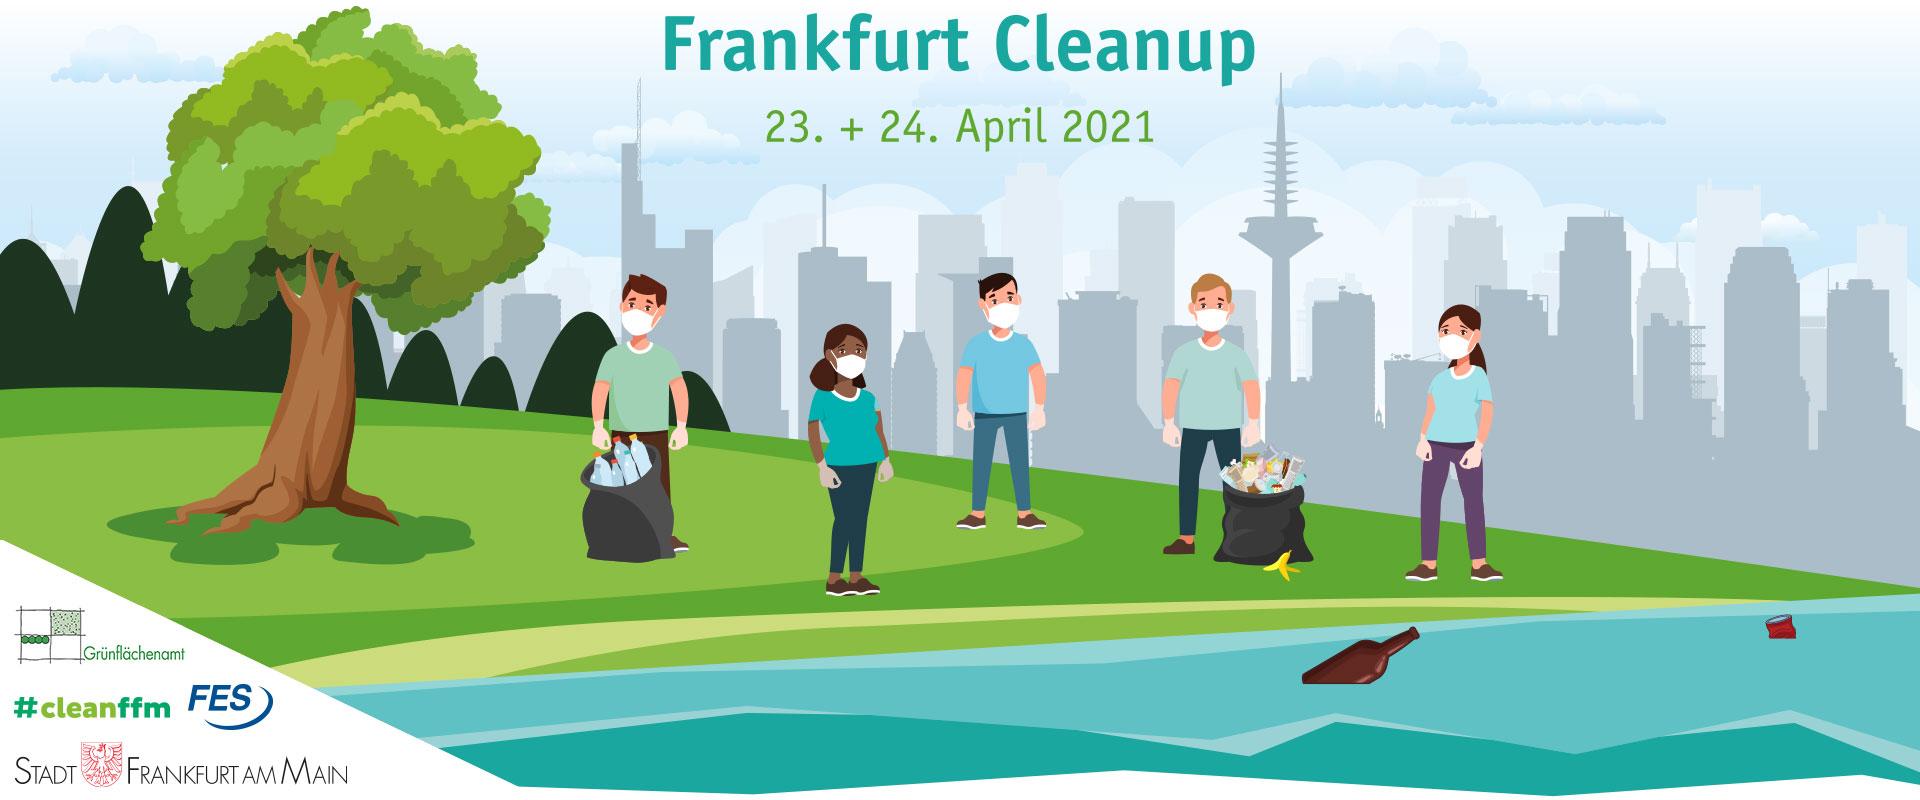 Cleaning Frankfurt